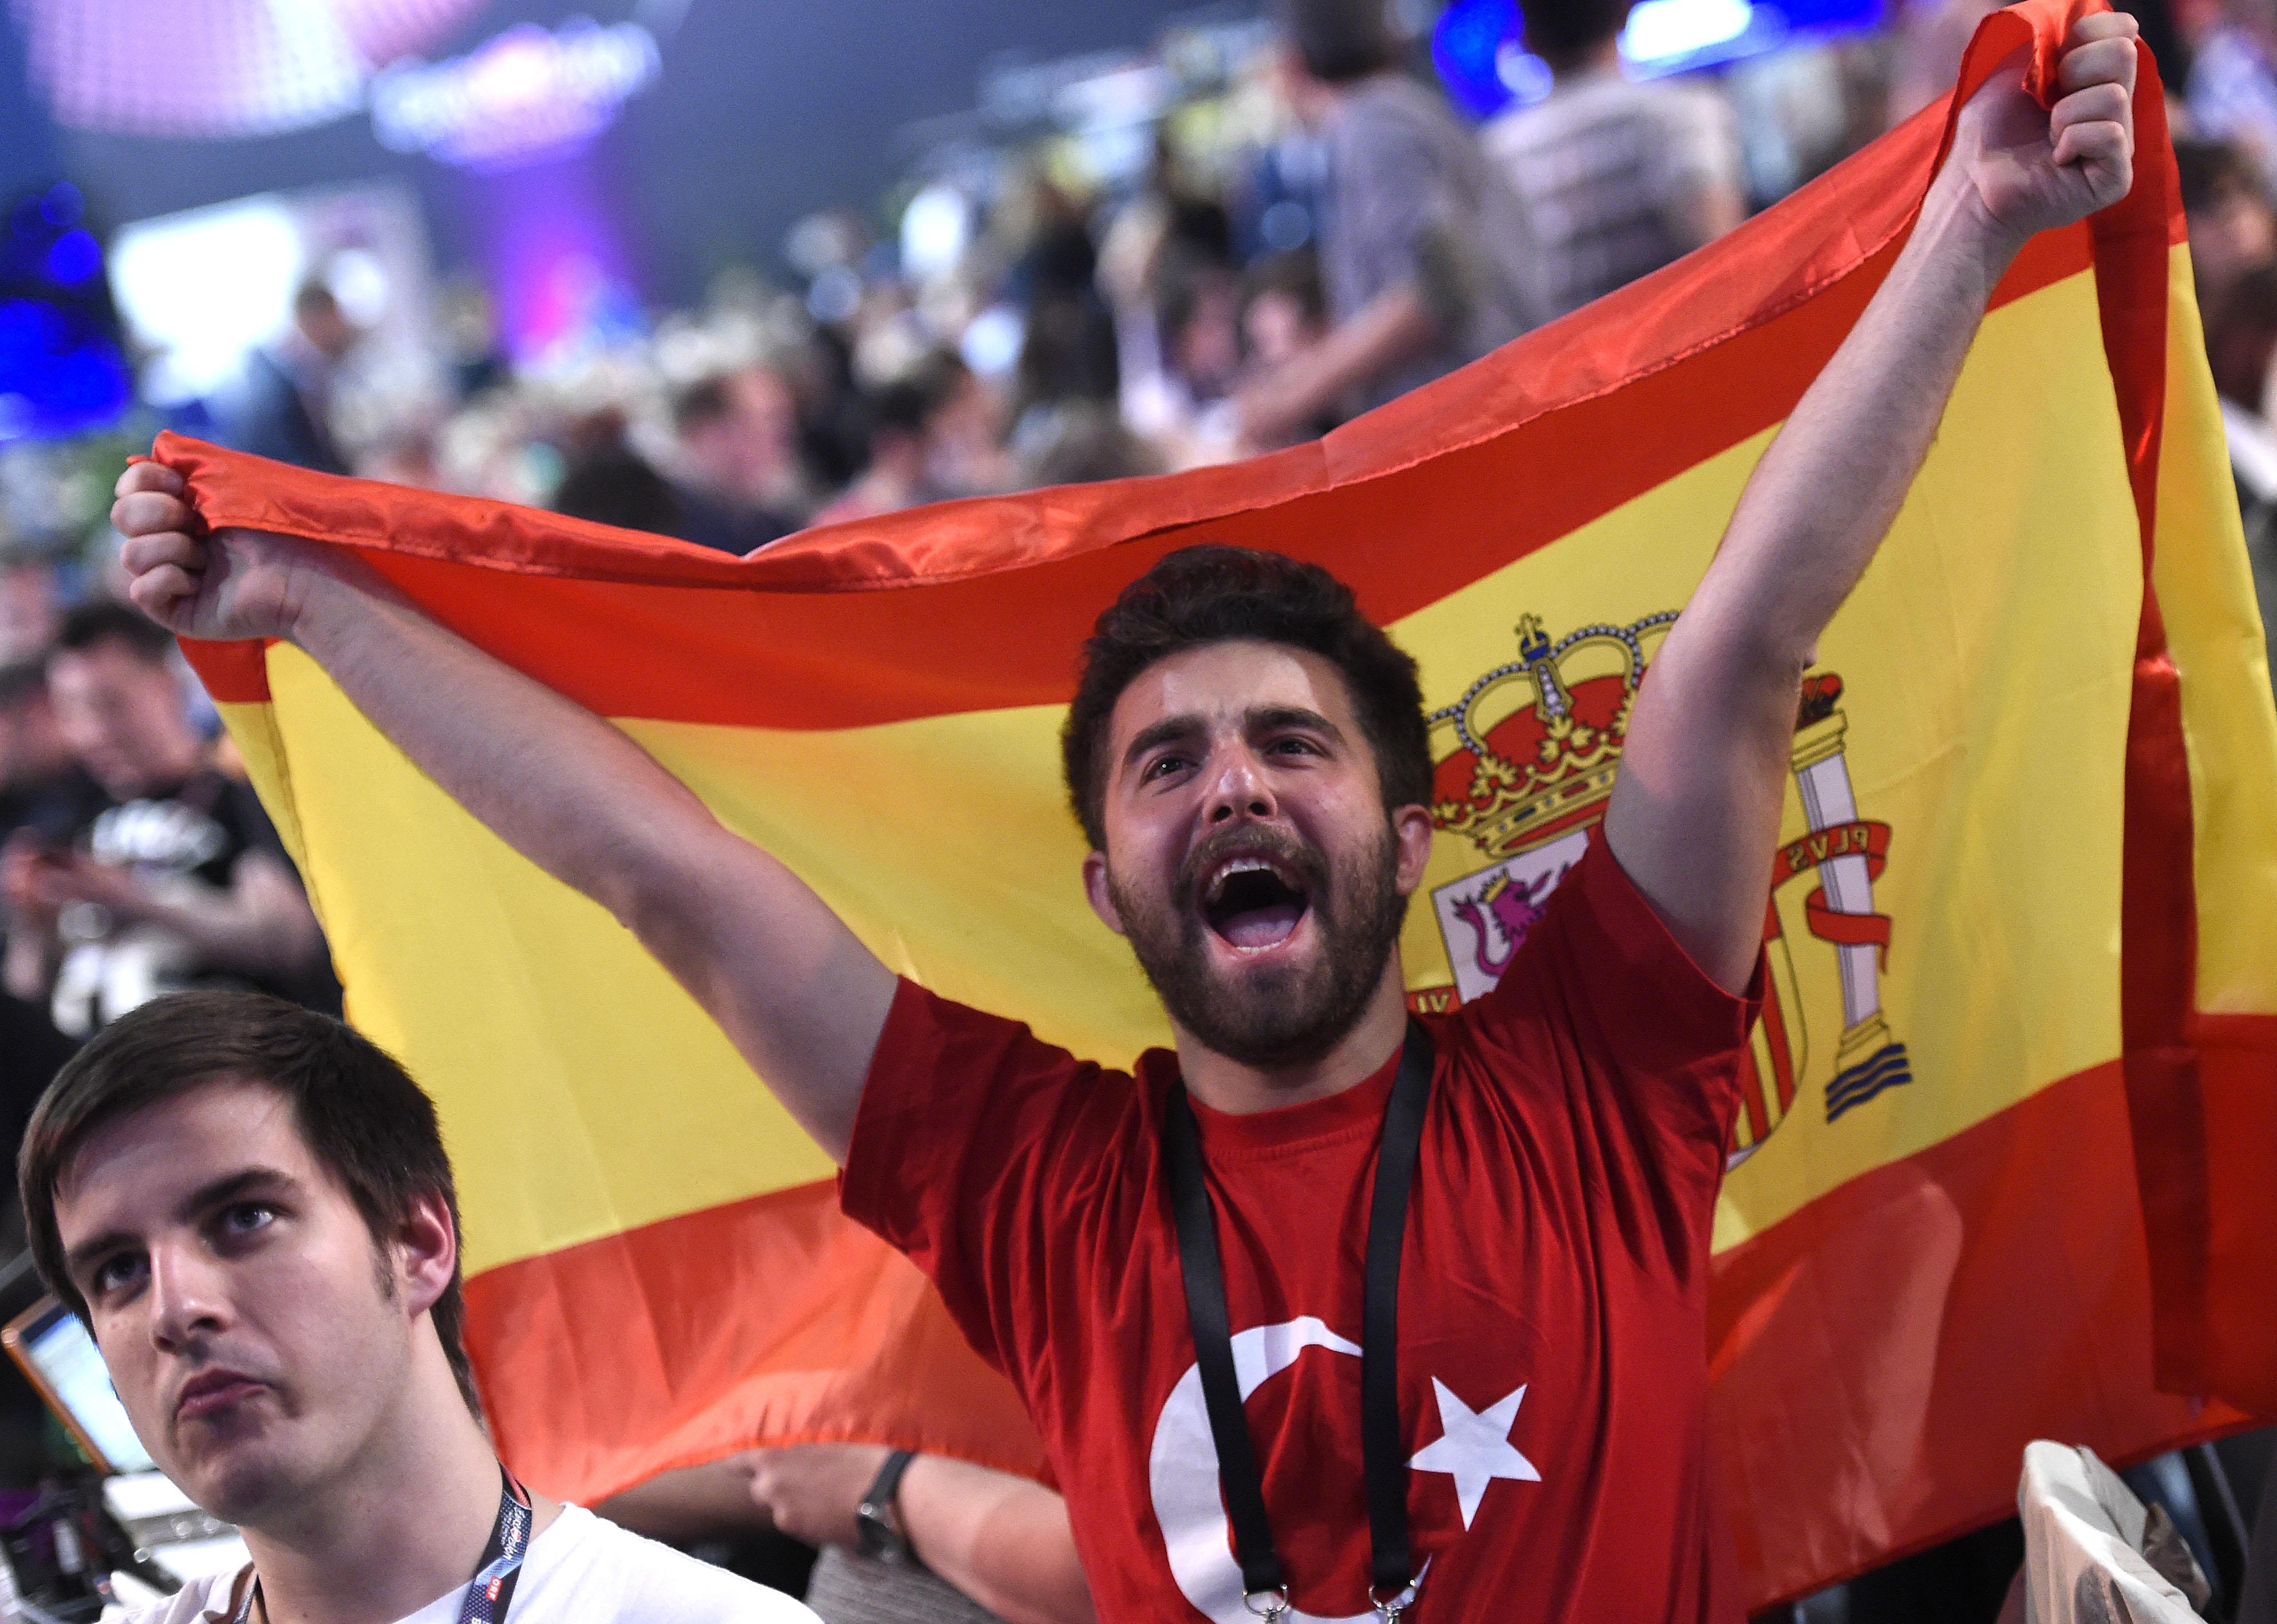 ABD0182_20150523 - WIEN - ÖSTERREICH: ESC-Fans am Samstag, 23. Mai 2015, anl. des Finales im Rahmen des 60. Eurovision Song